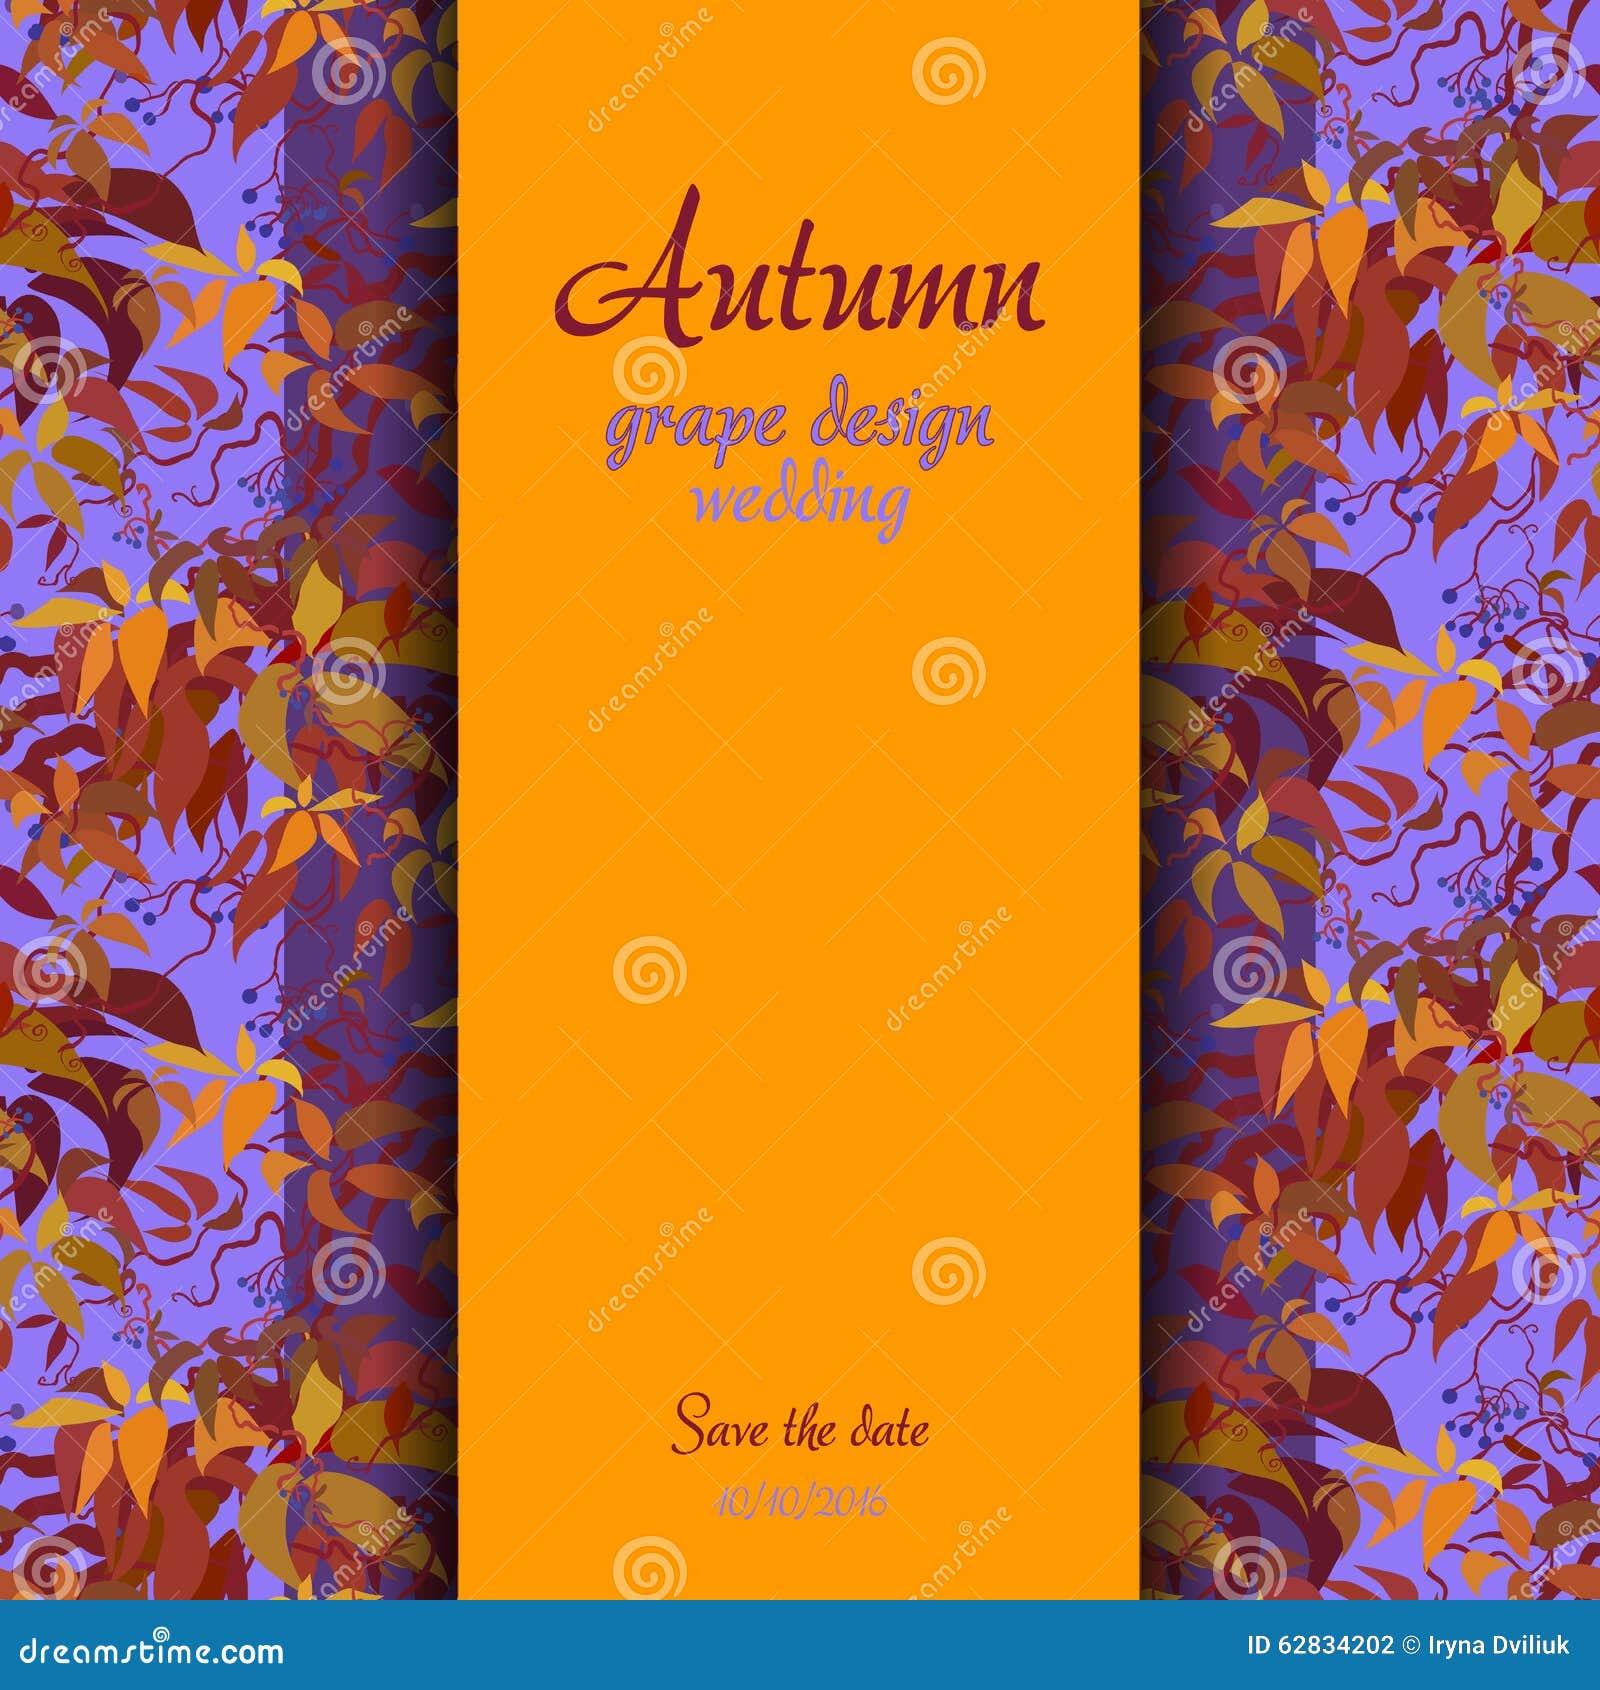 autumn grape with orange leaves background vertical border wedding design illustration 62834202 megapixl autumn grape with orange leaves background vertical border wedding design illustration 62834202 megapixl